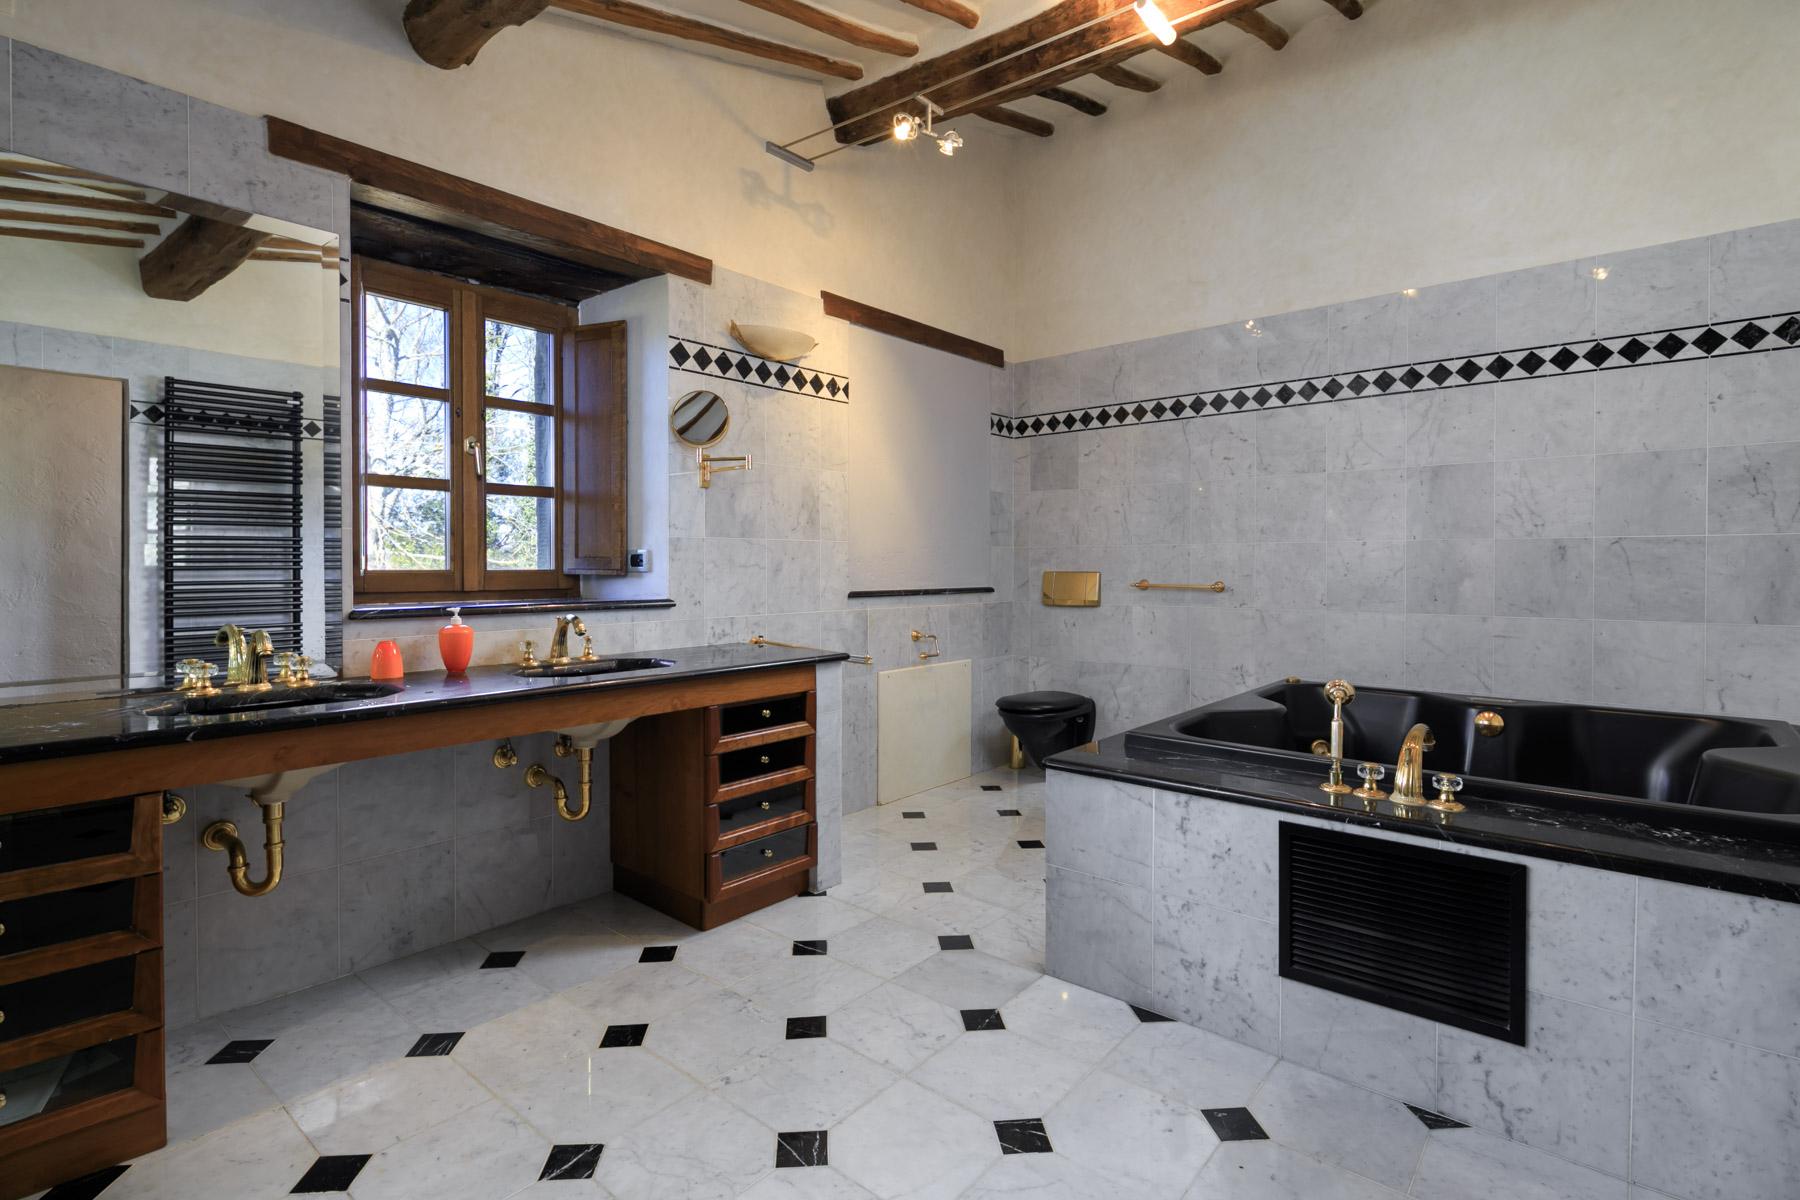 Villa in Vendita a Gaiole In Chianti: 5 locali, 465 mq - Foto 27